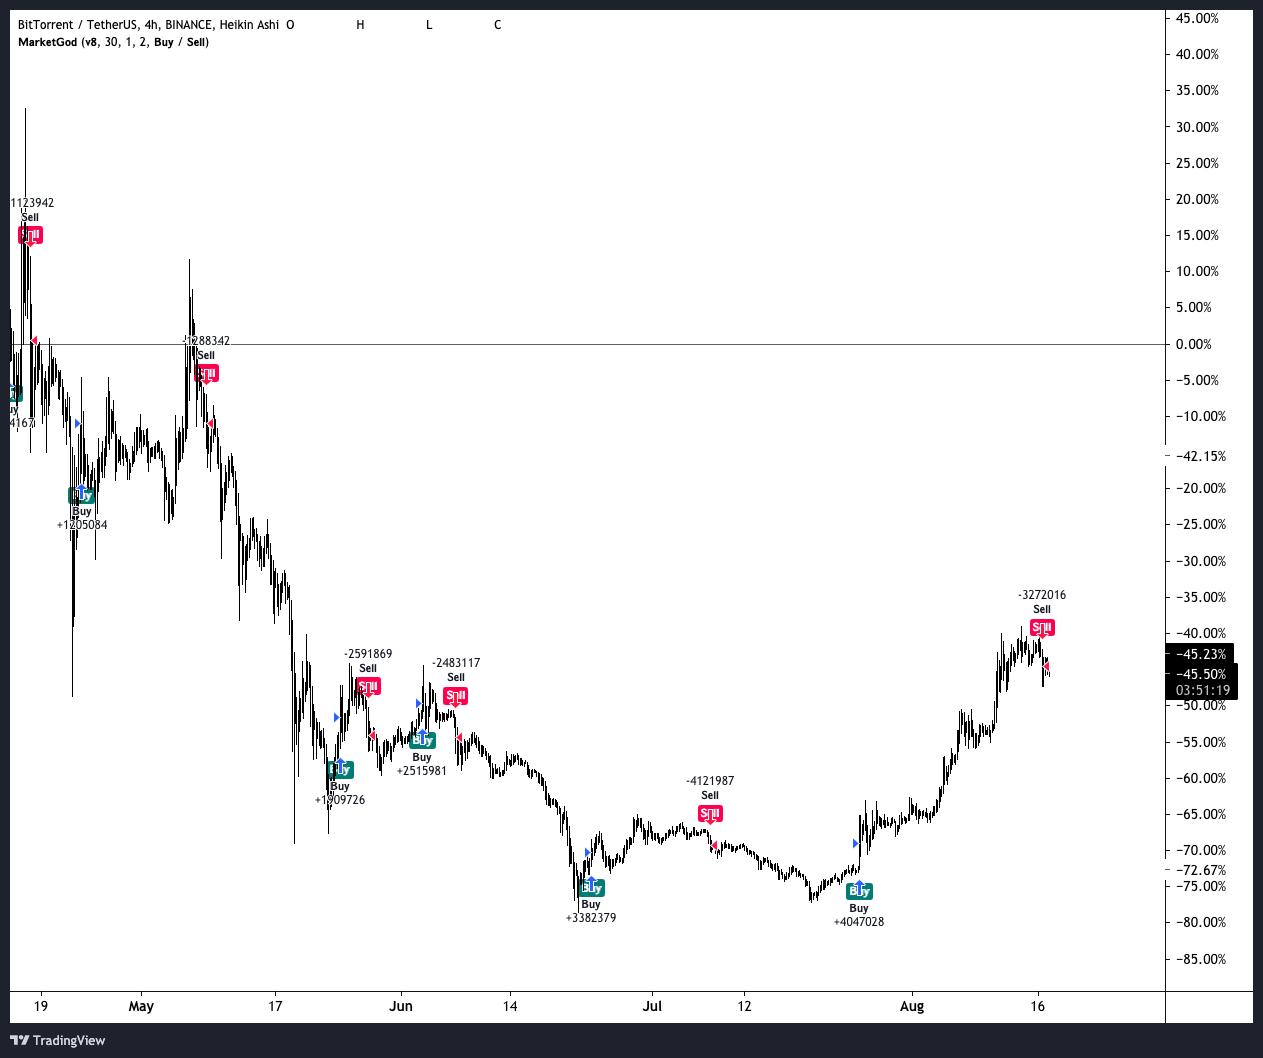 Charting BTT vs USDT using MarketGod for Tradingview and MarketGod v8 in 2020